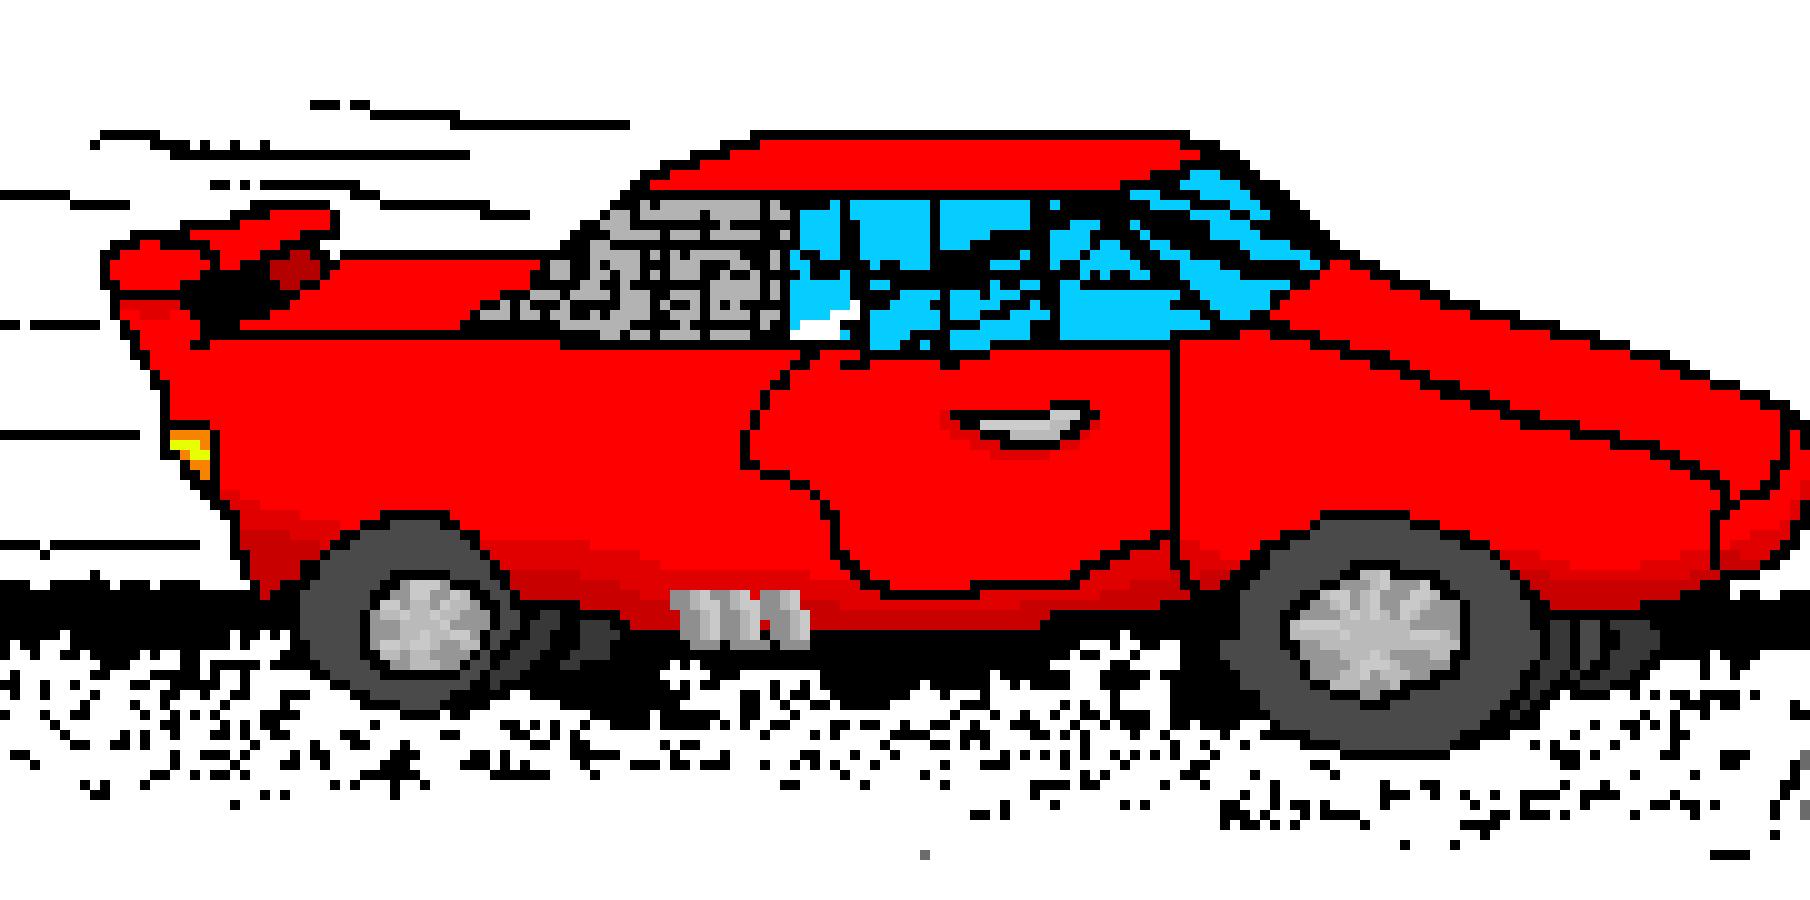 Race Car Pixel Art Maker